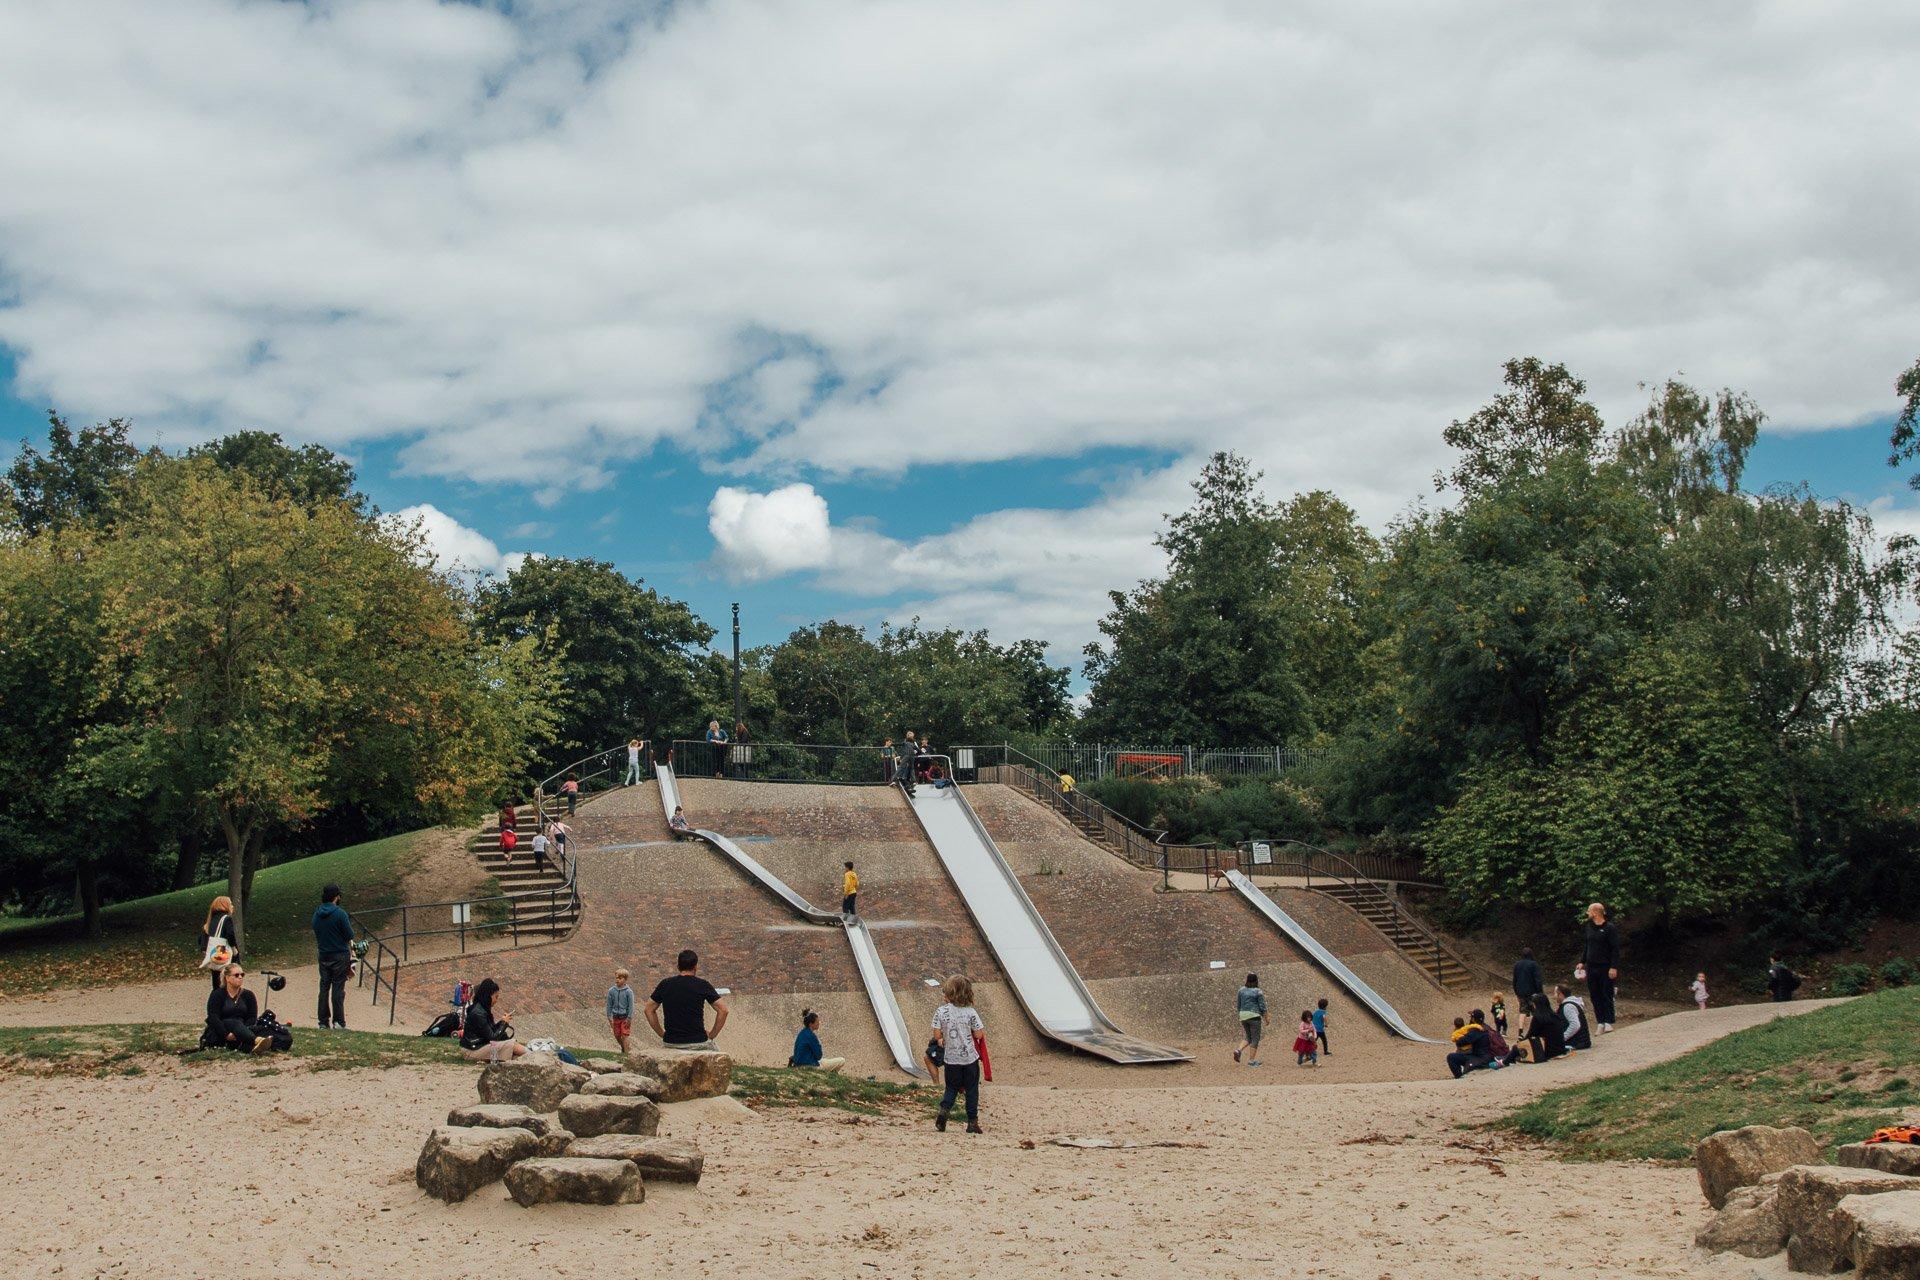 Victoria Park for kids